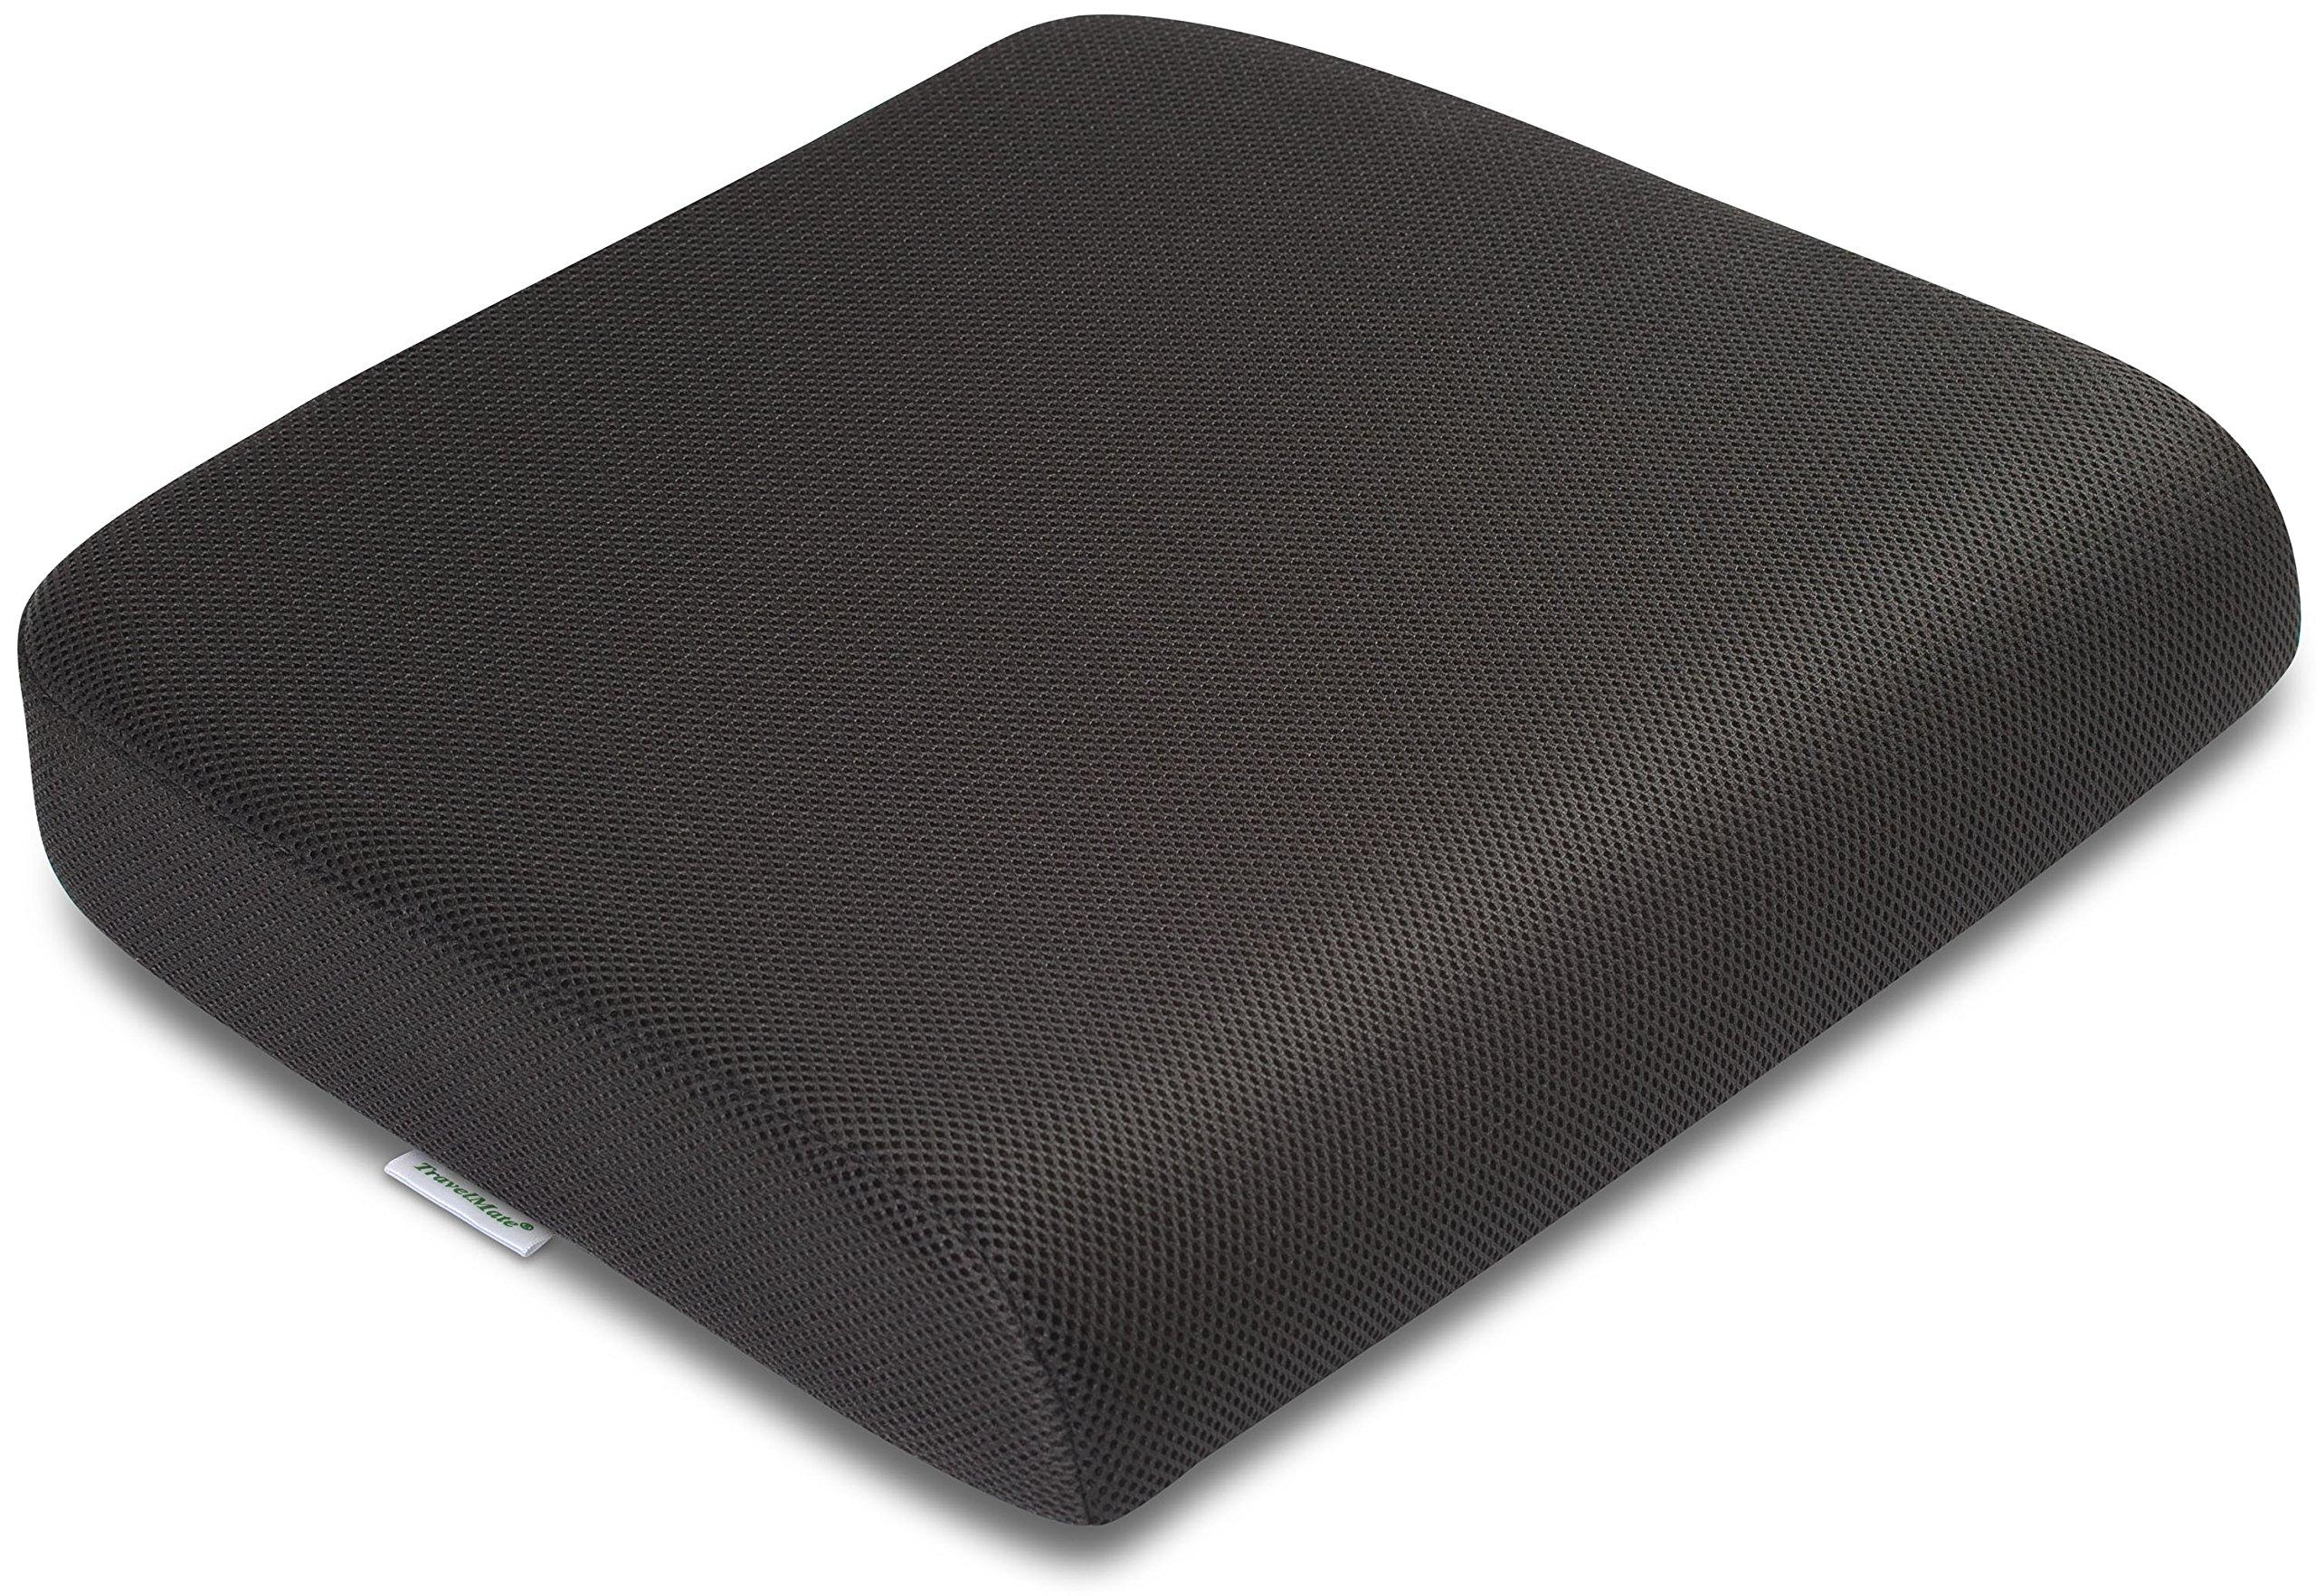 TravelMate Extra Large Memory Foam Cushion